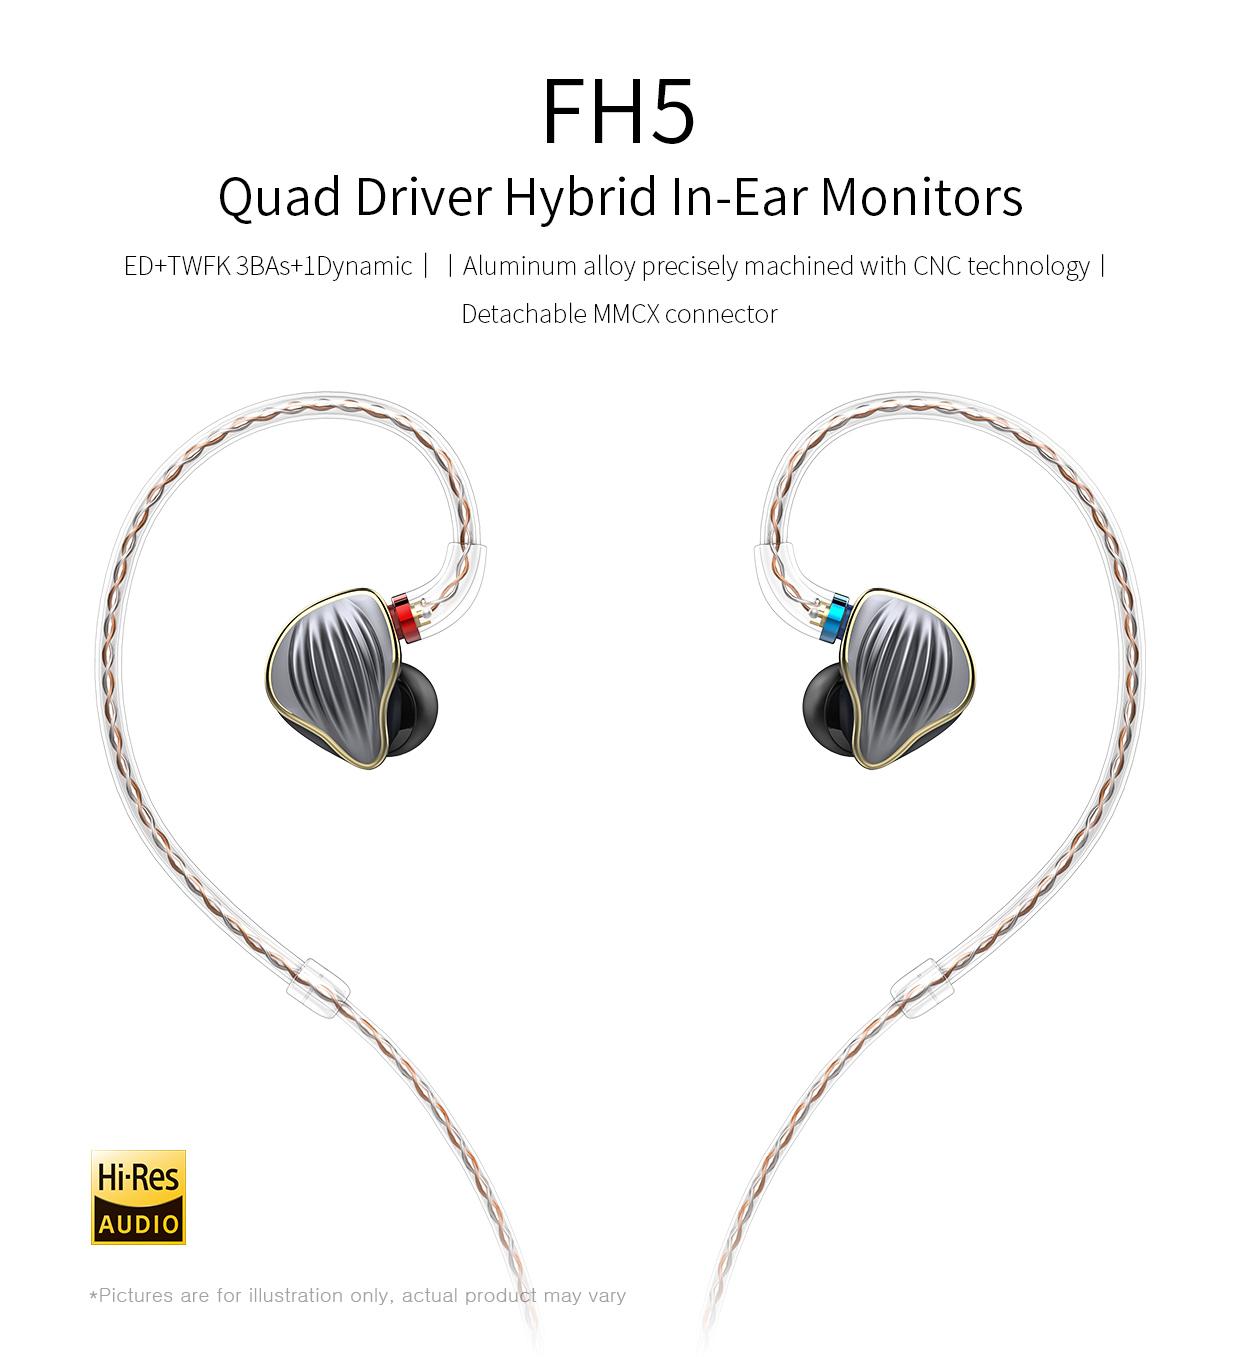 FH5-1